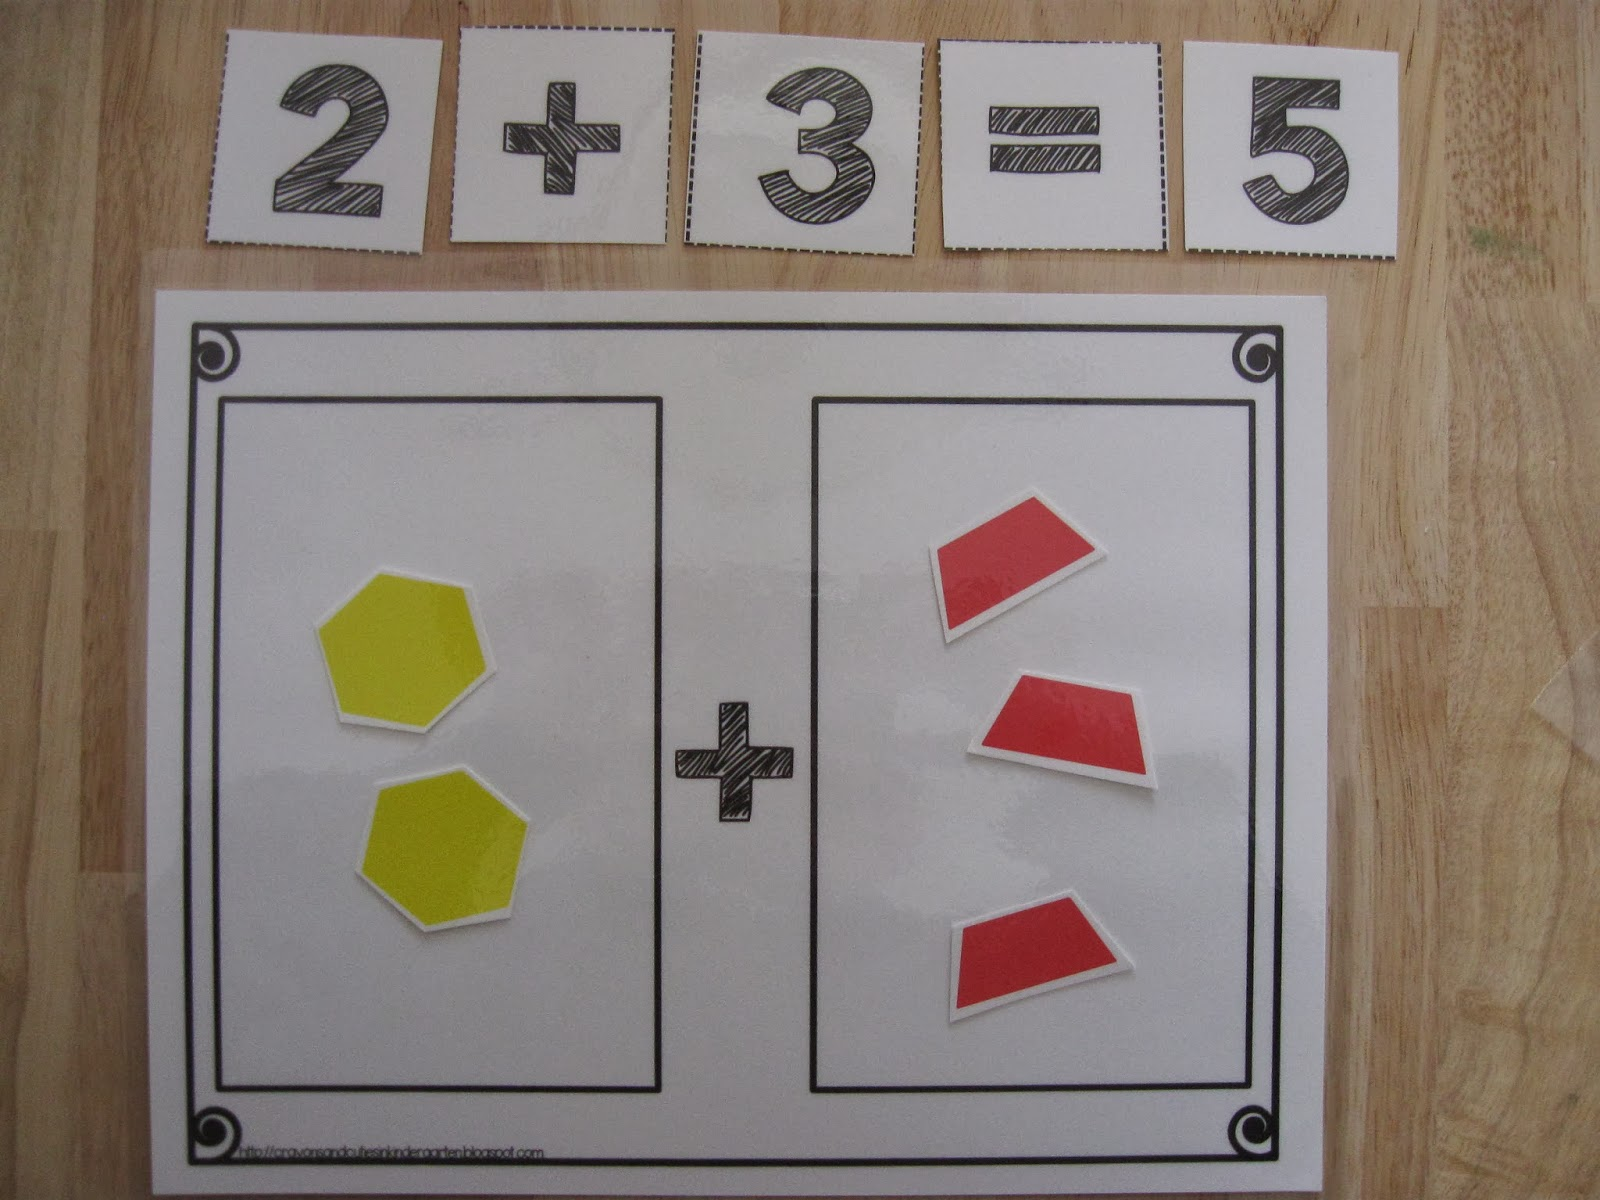 Crayons Amp Cuties In Kindergarten Bright Math Ideas Blog Hop Joining Groups Jamboree